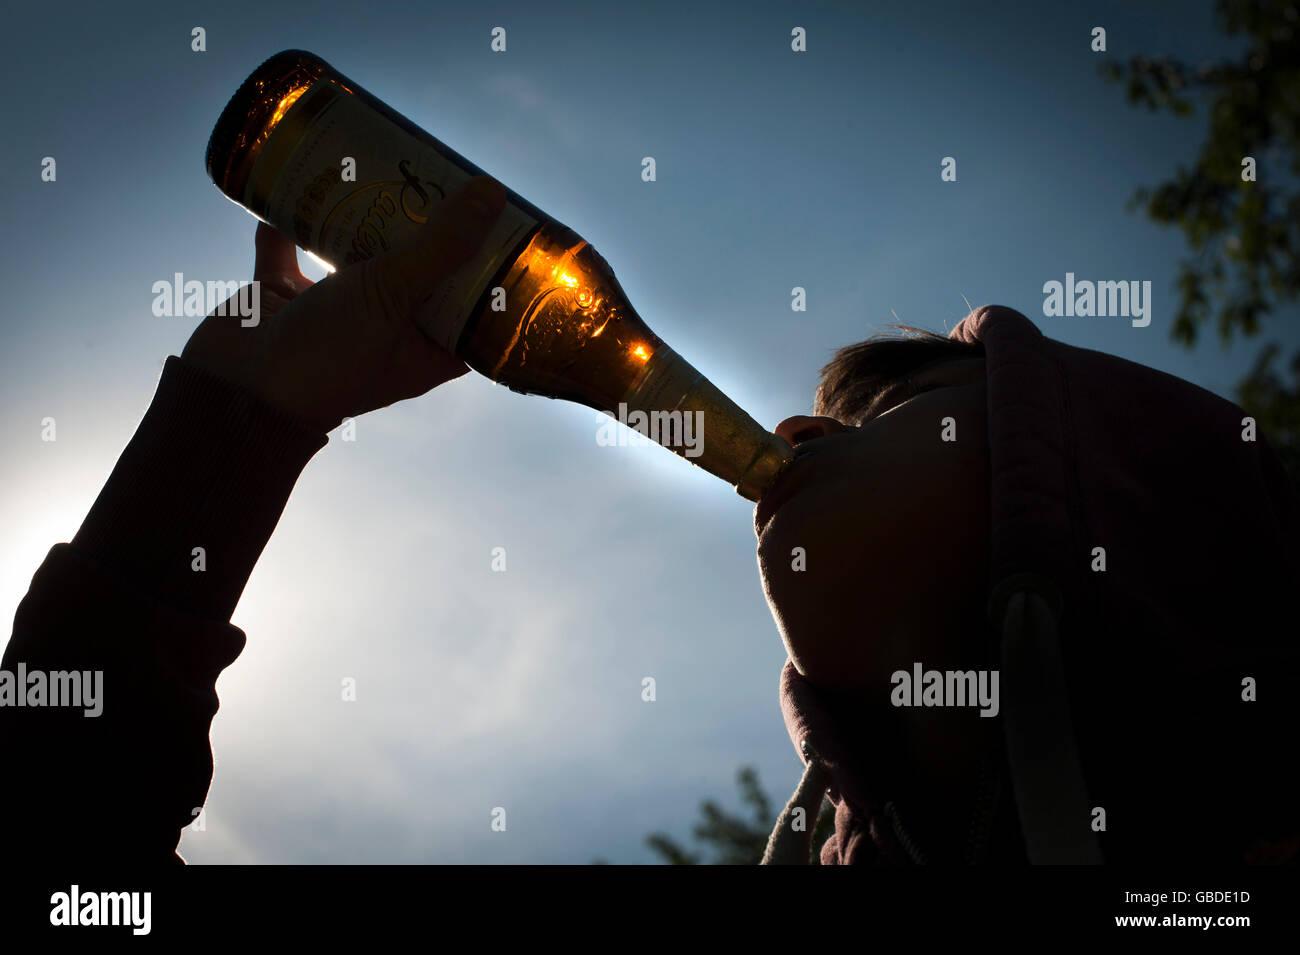 Teenager drinking beer. - Stock Image